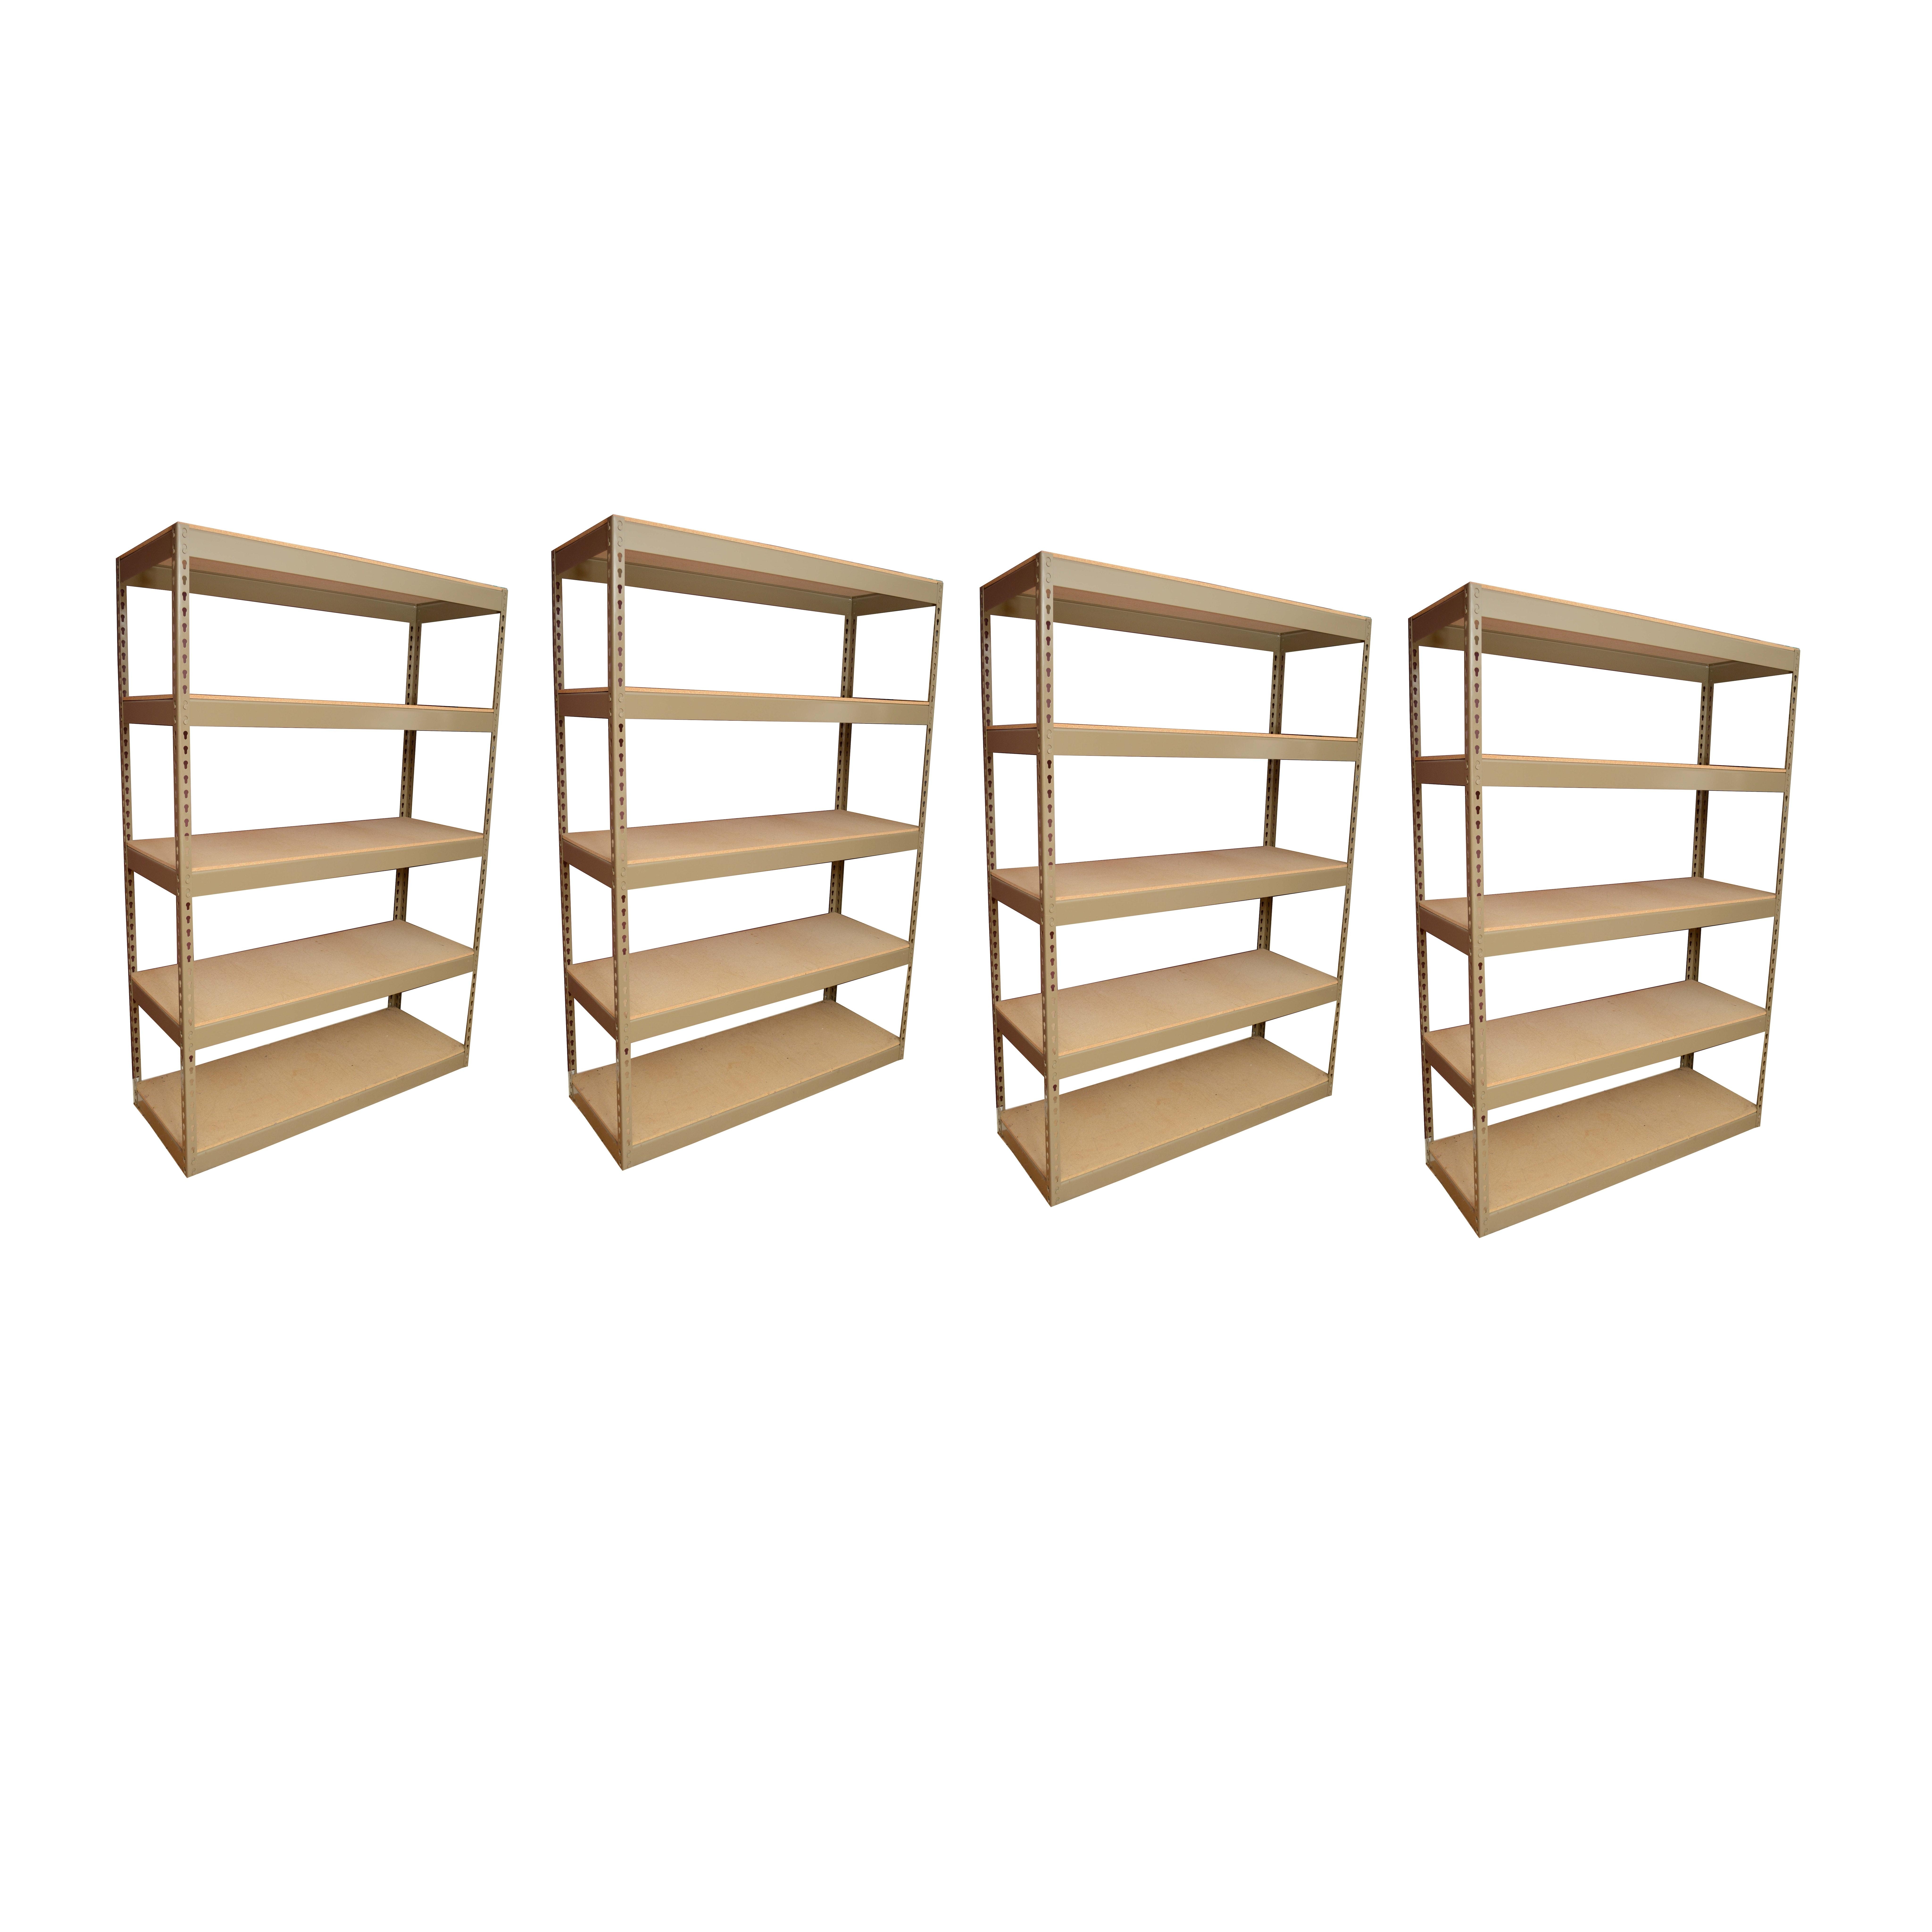 Set of Metal Utility Shelves